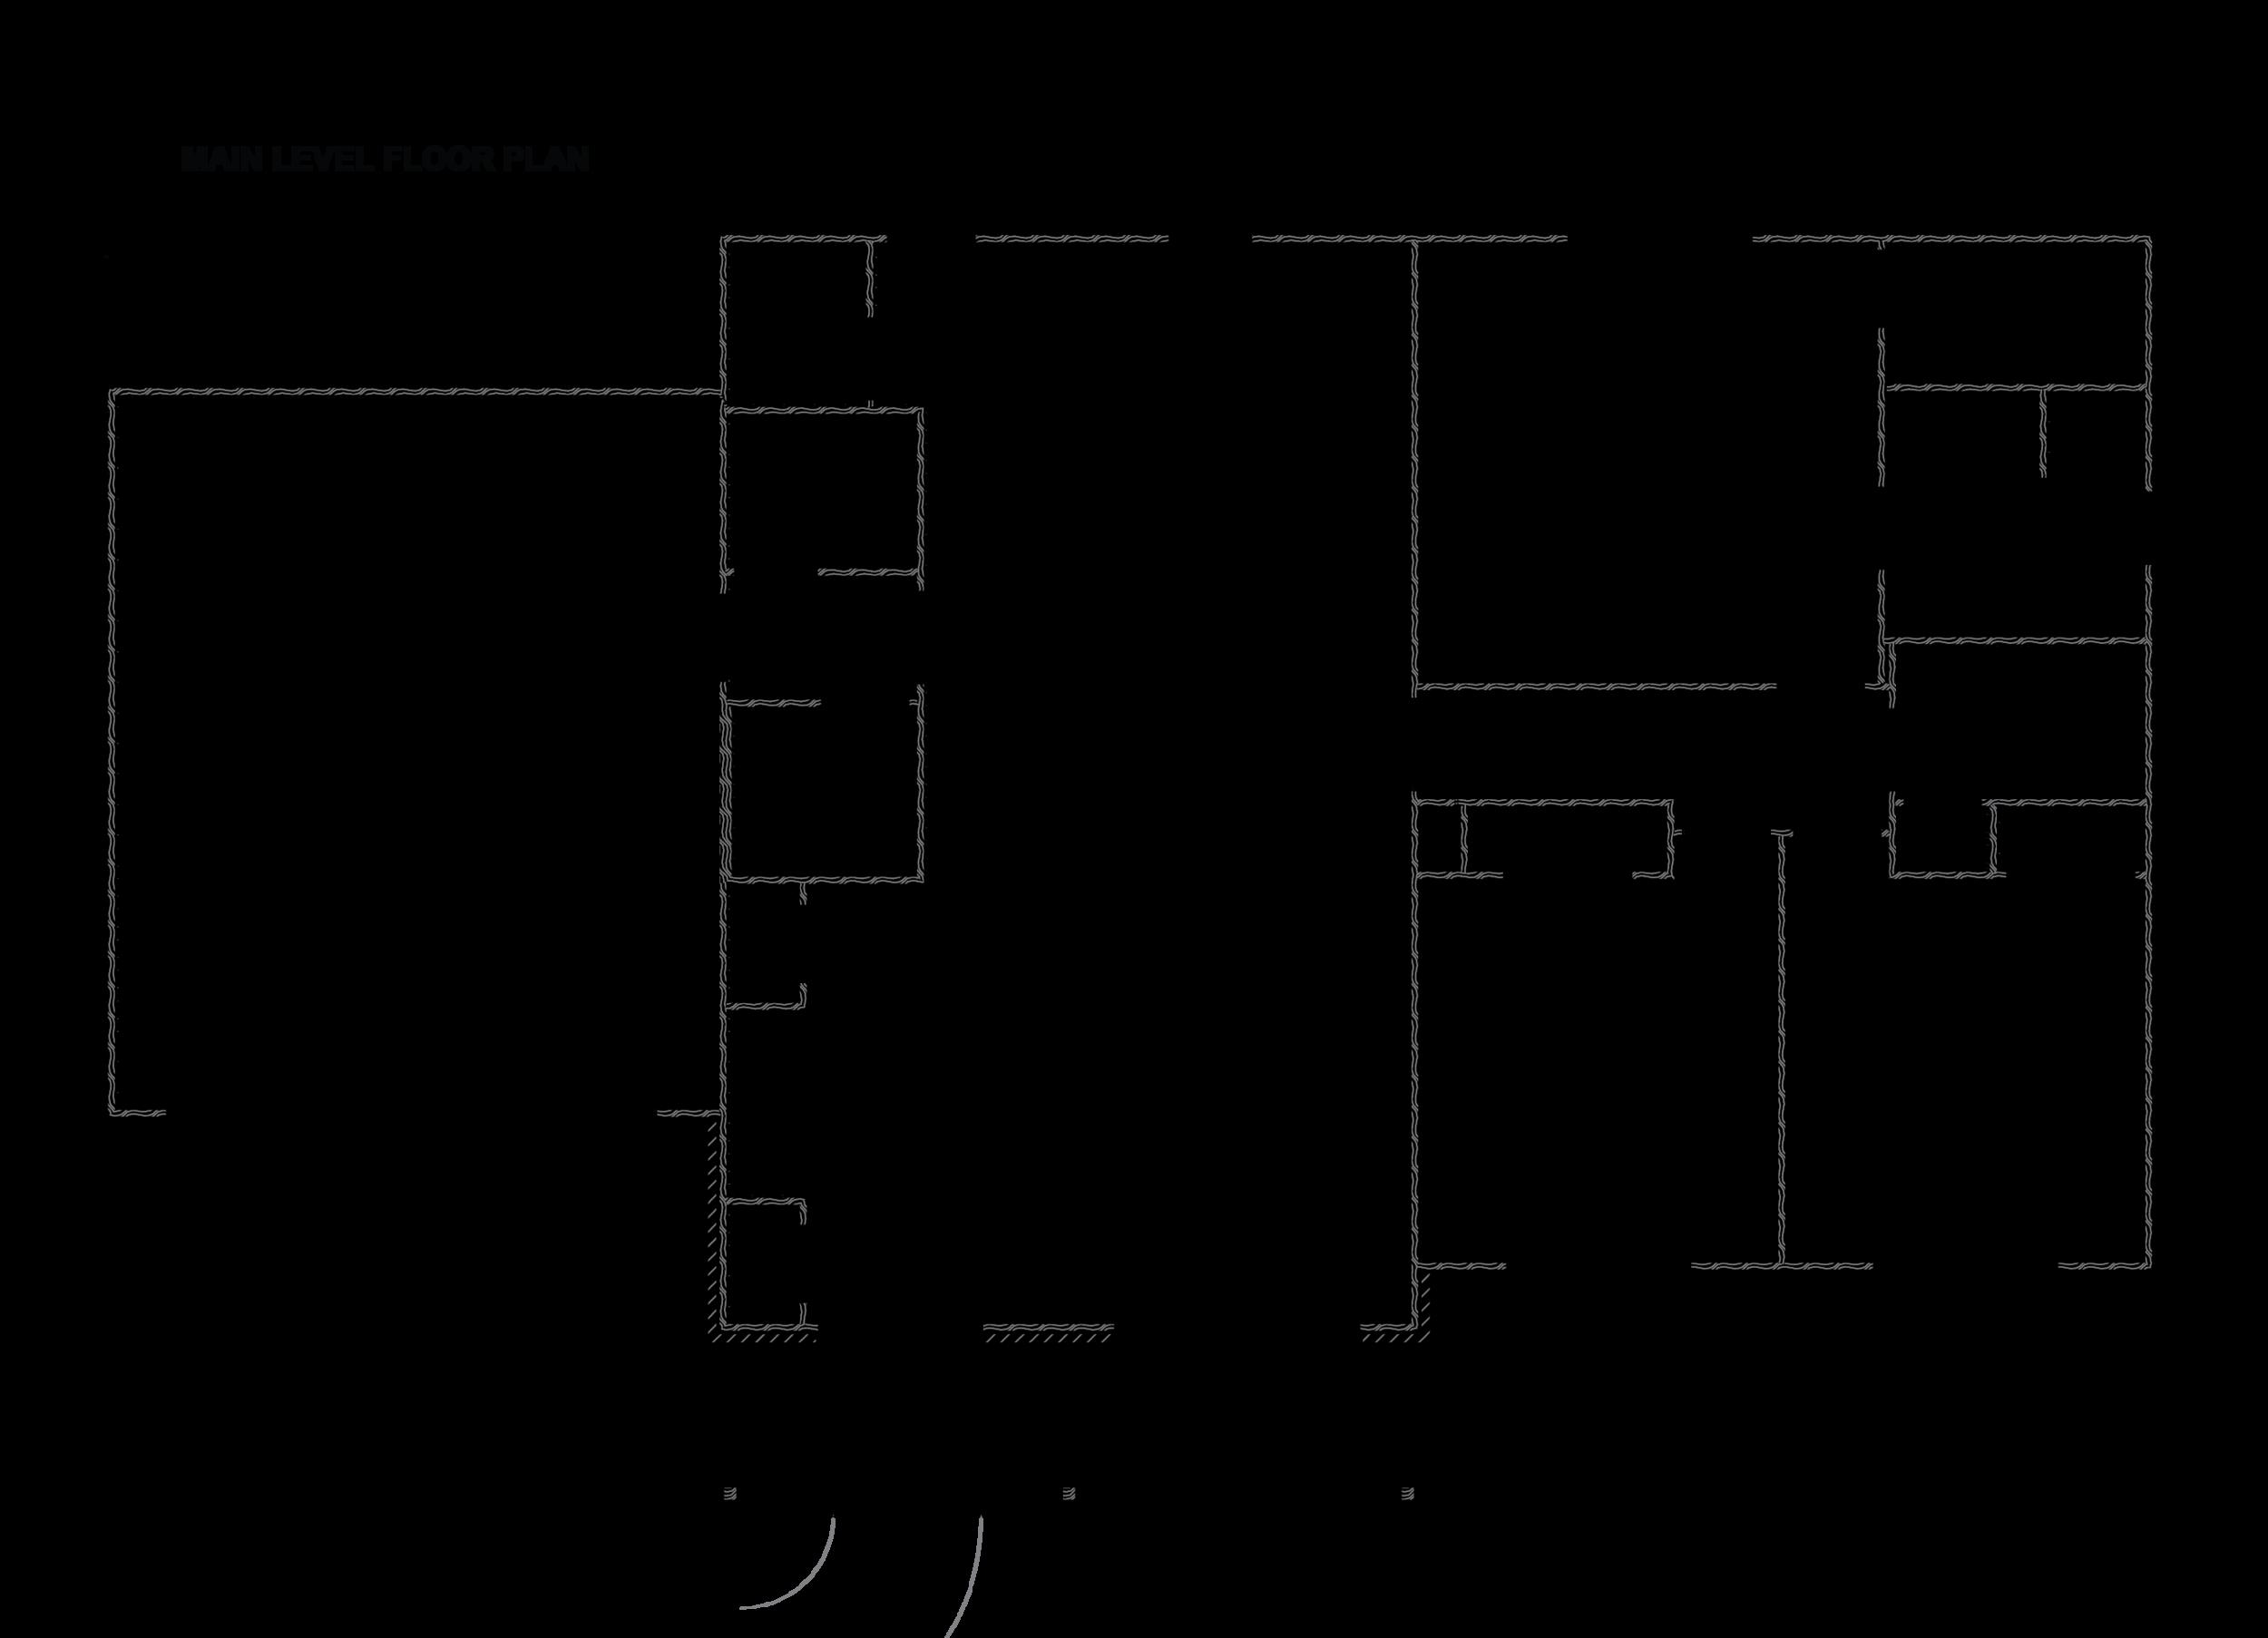 The Flynn House Plan_Artboard 2.png